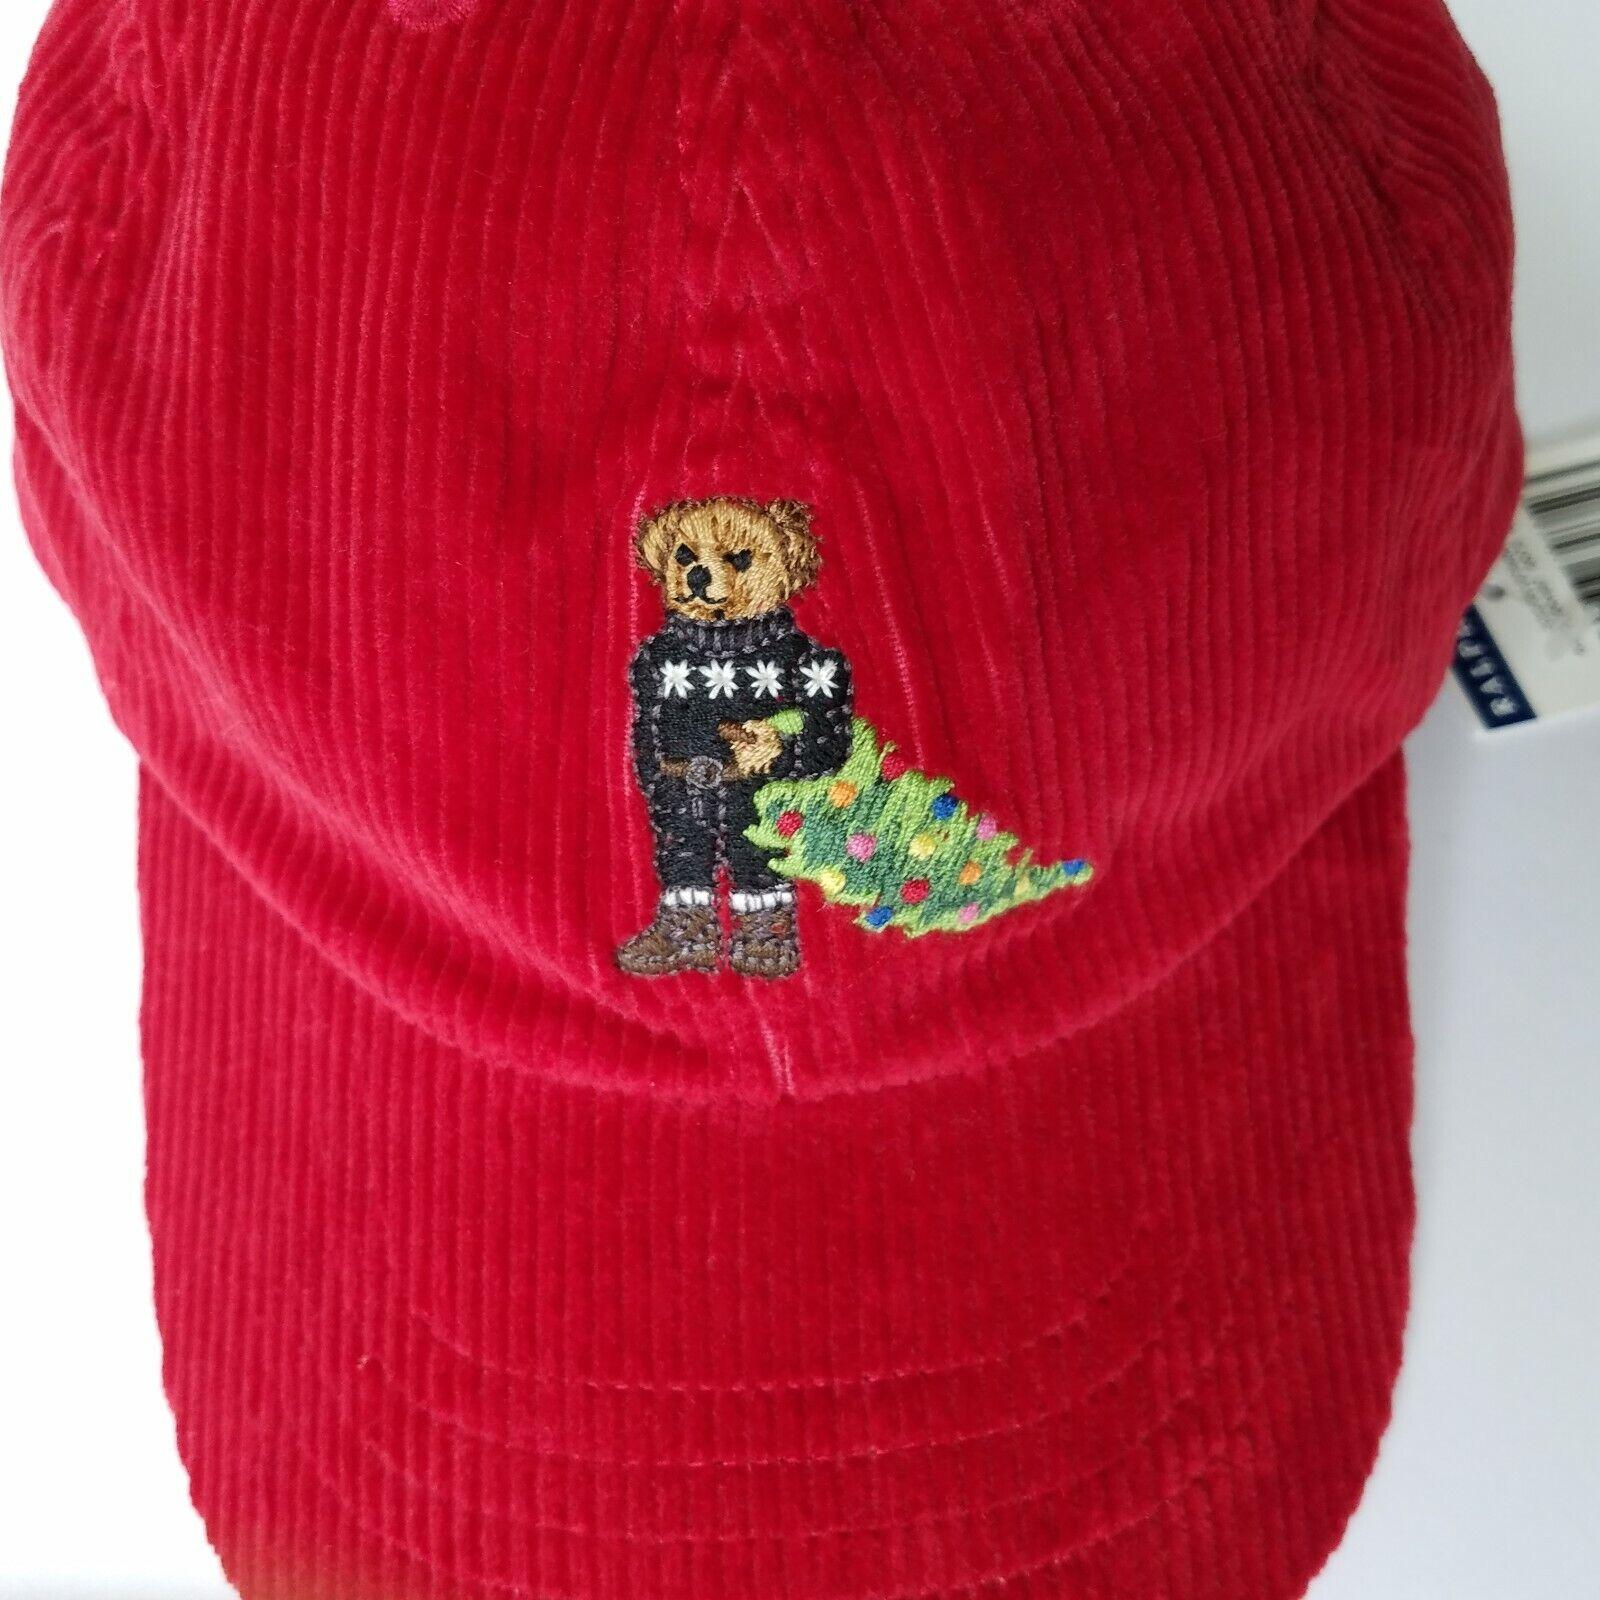 Polo Ralph Lauren Boys Polo Christmas Bear Red Cap One Size: